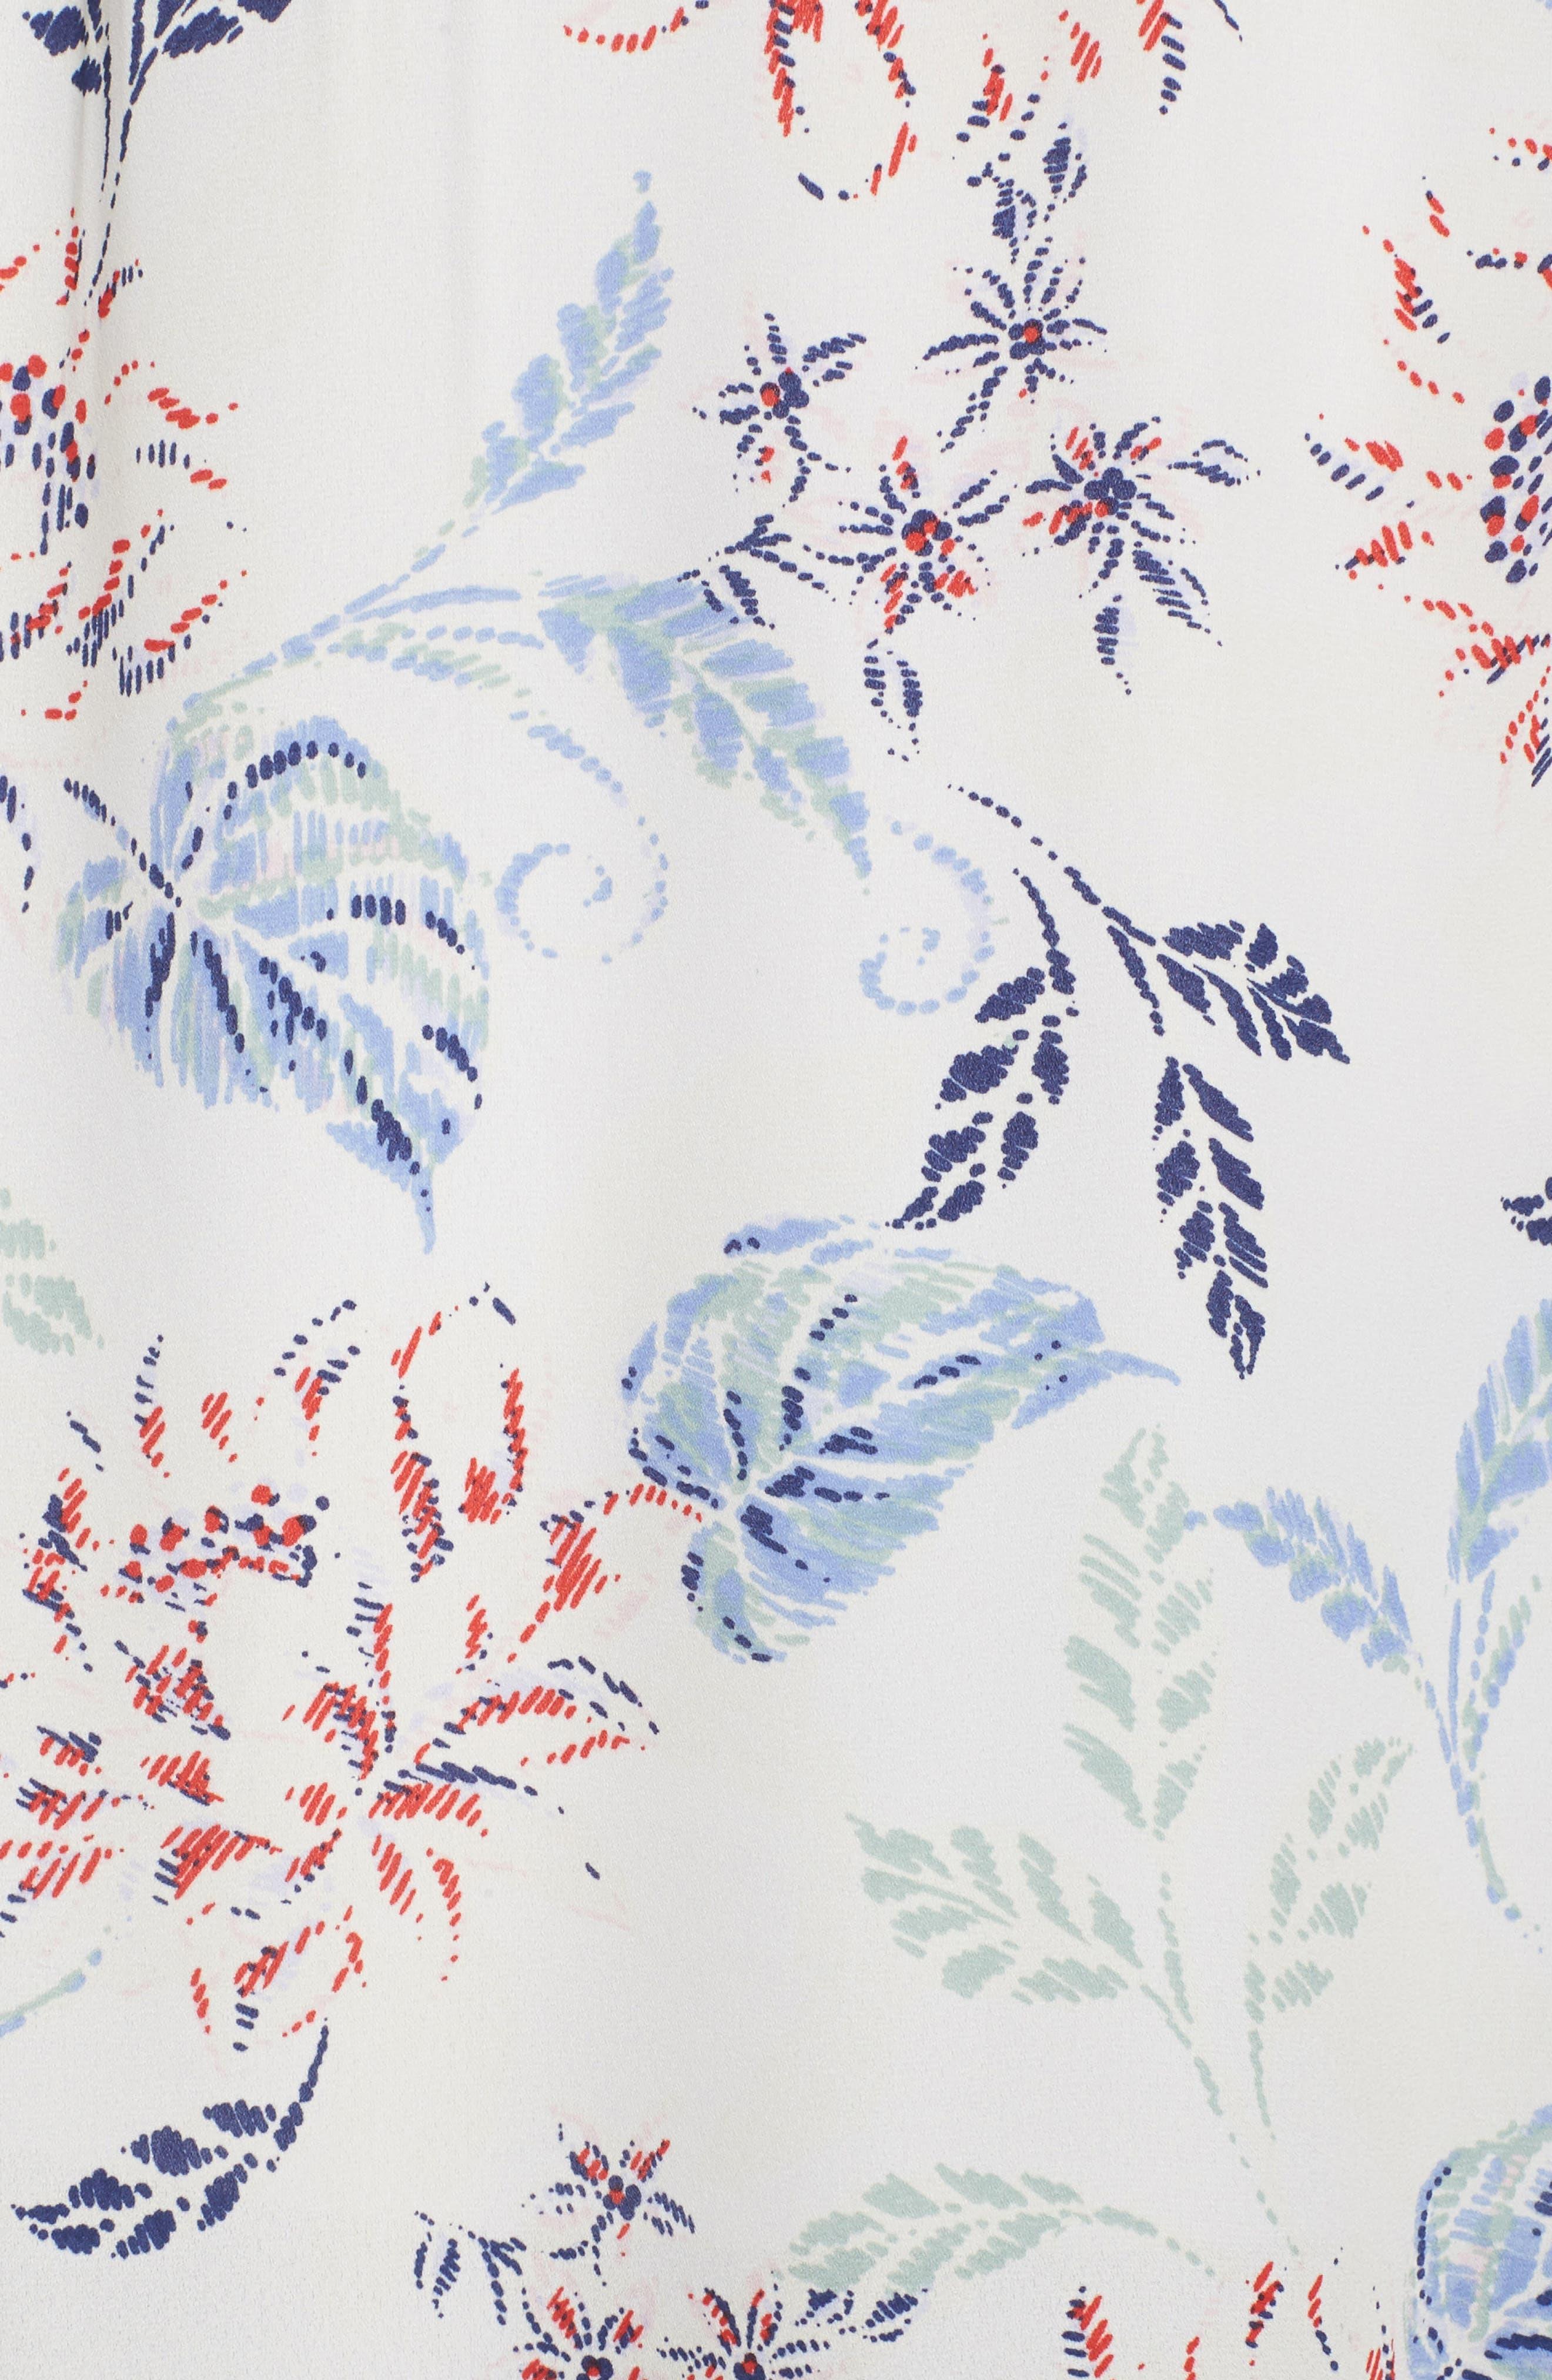 Floral Print Cap Sleeve Blouse,                             Alternate thumbnail 5, color,                             907